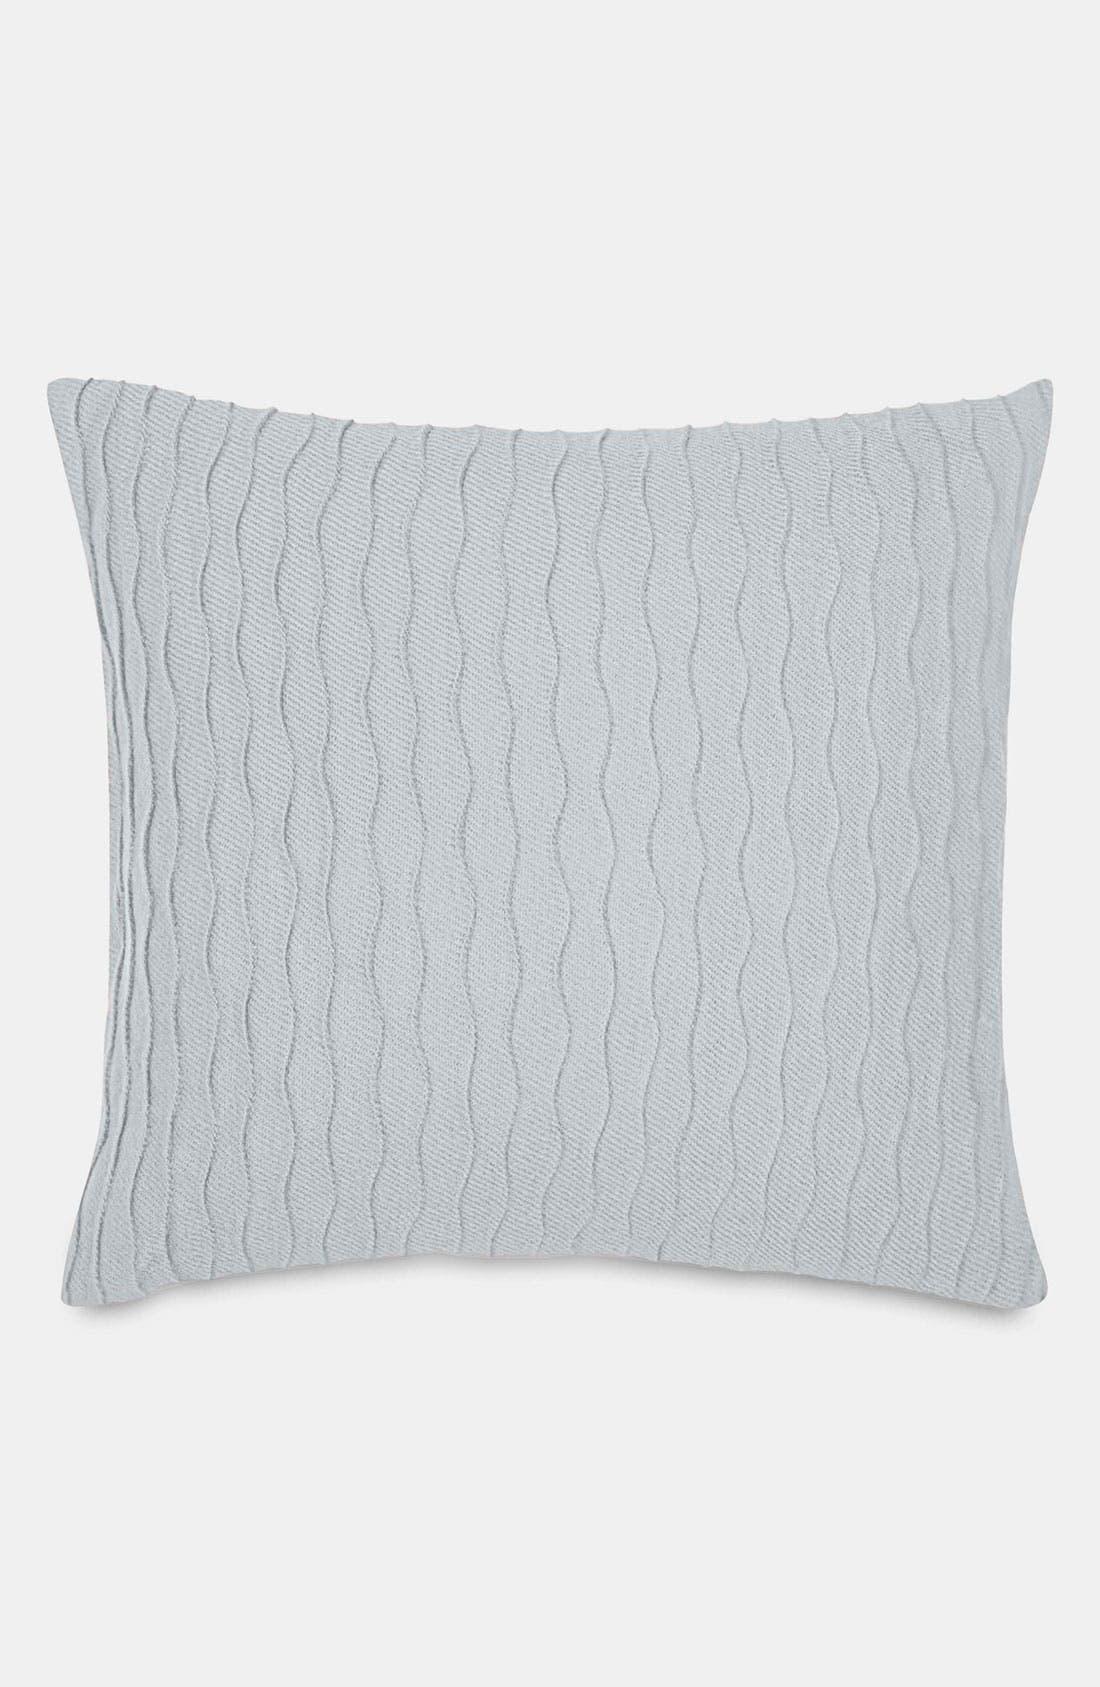 Main Image - DKNY 'Urban Tide' Euro Pillow Sham